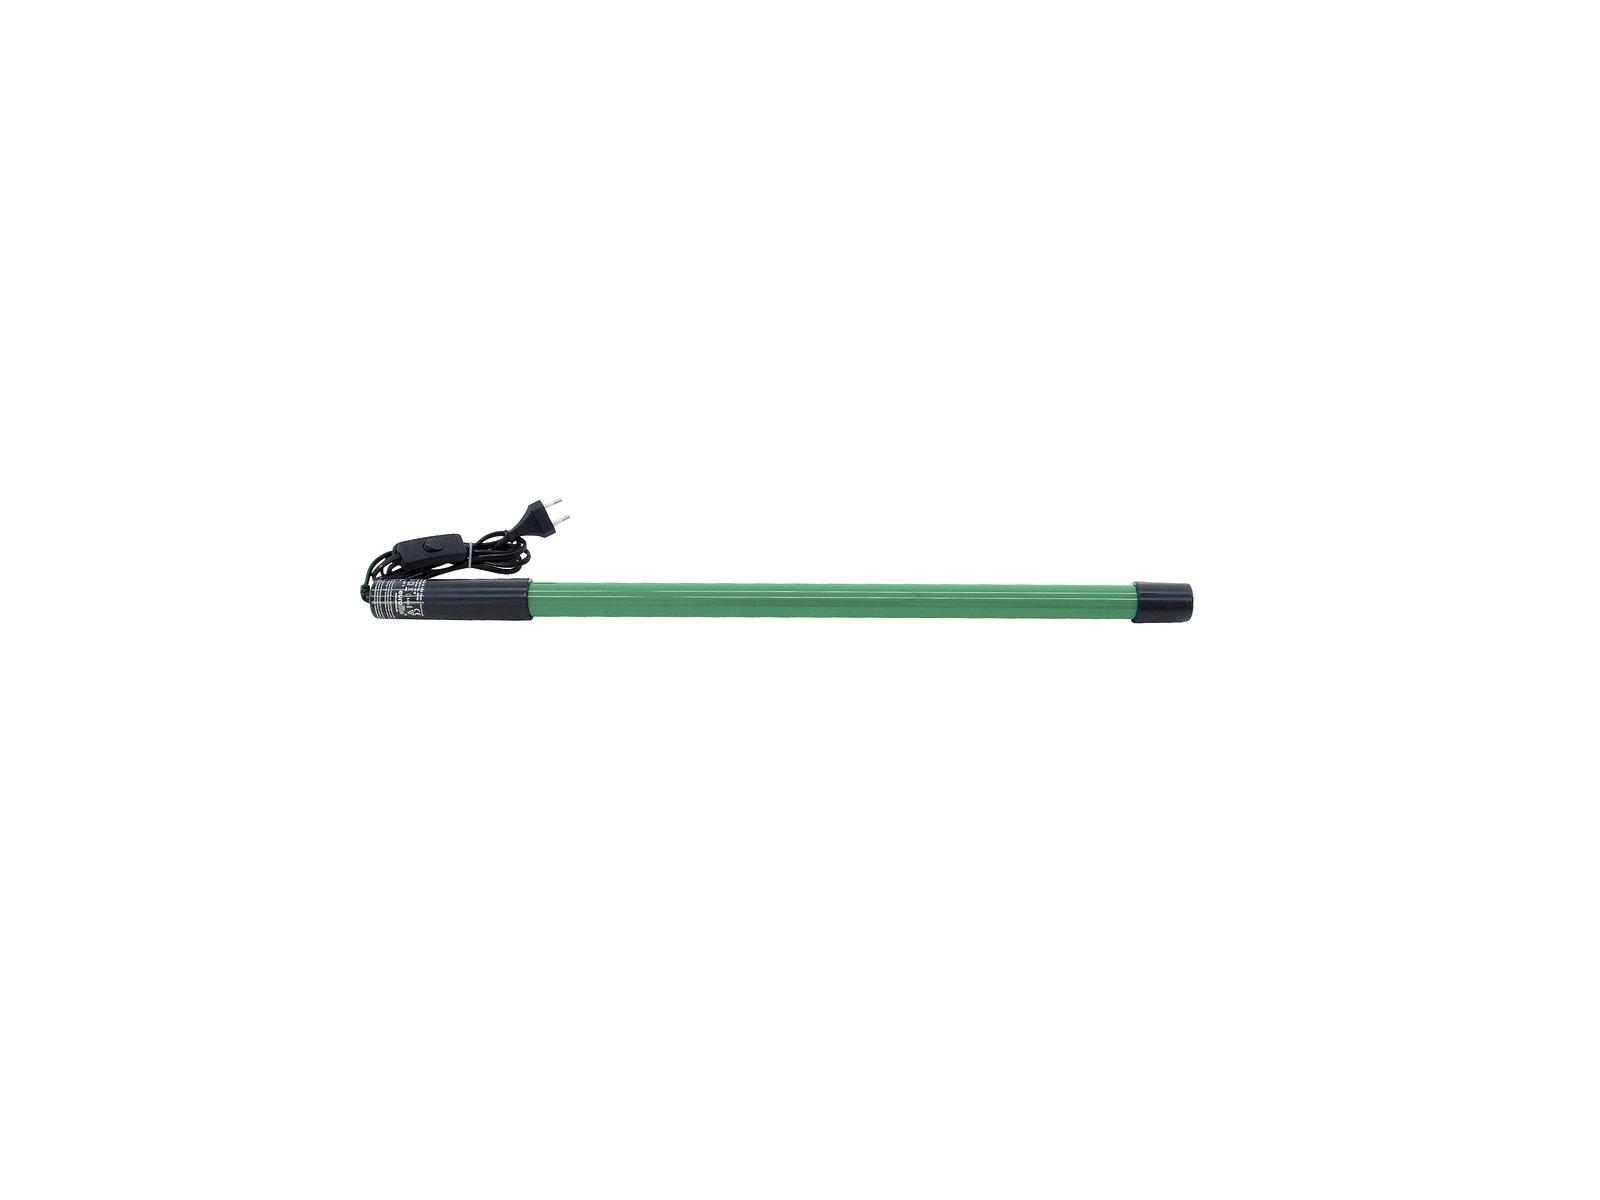 EUROLITE Leuchtstab T8 18W 70cm grün L